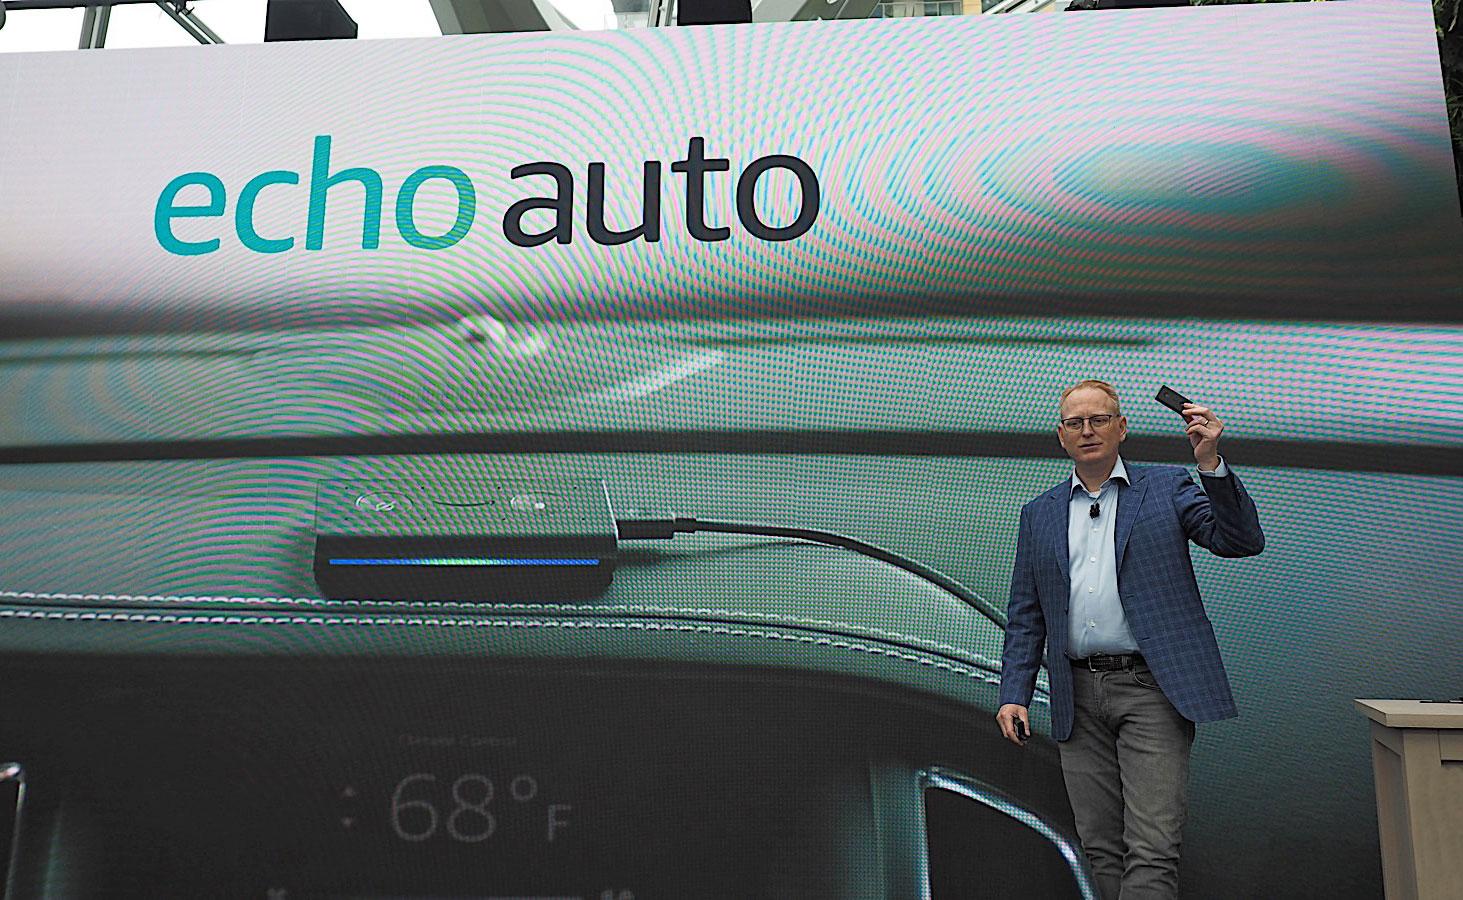 amazon s echo auto puts alexa in any car sound books. Black Bedroom Furniture Sets. Home Design Ideas